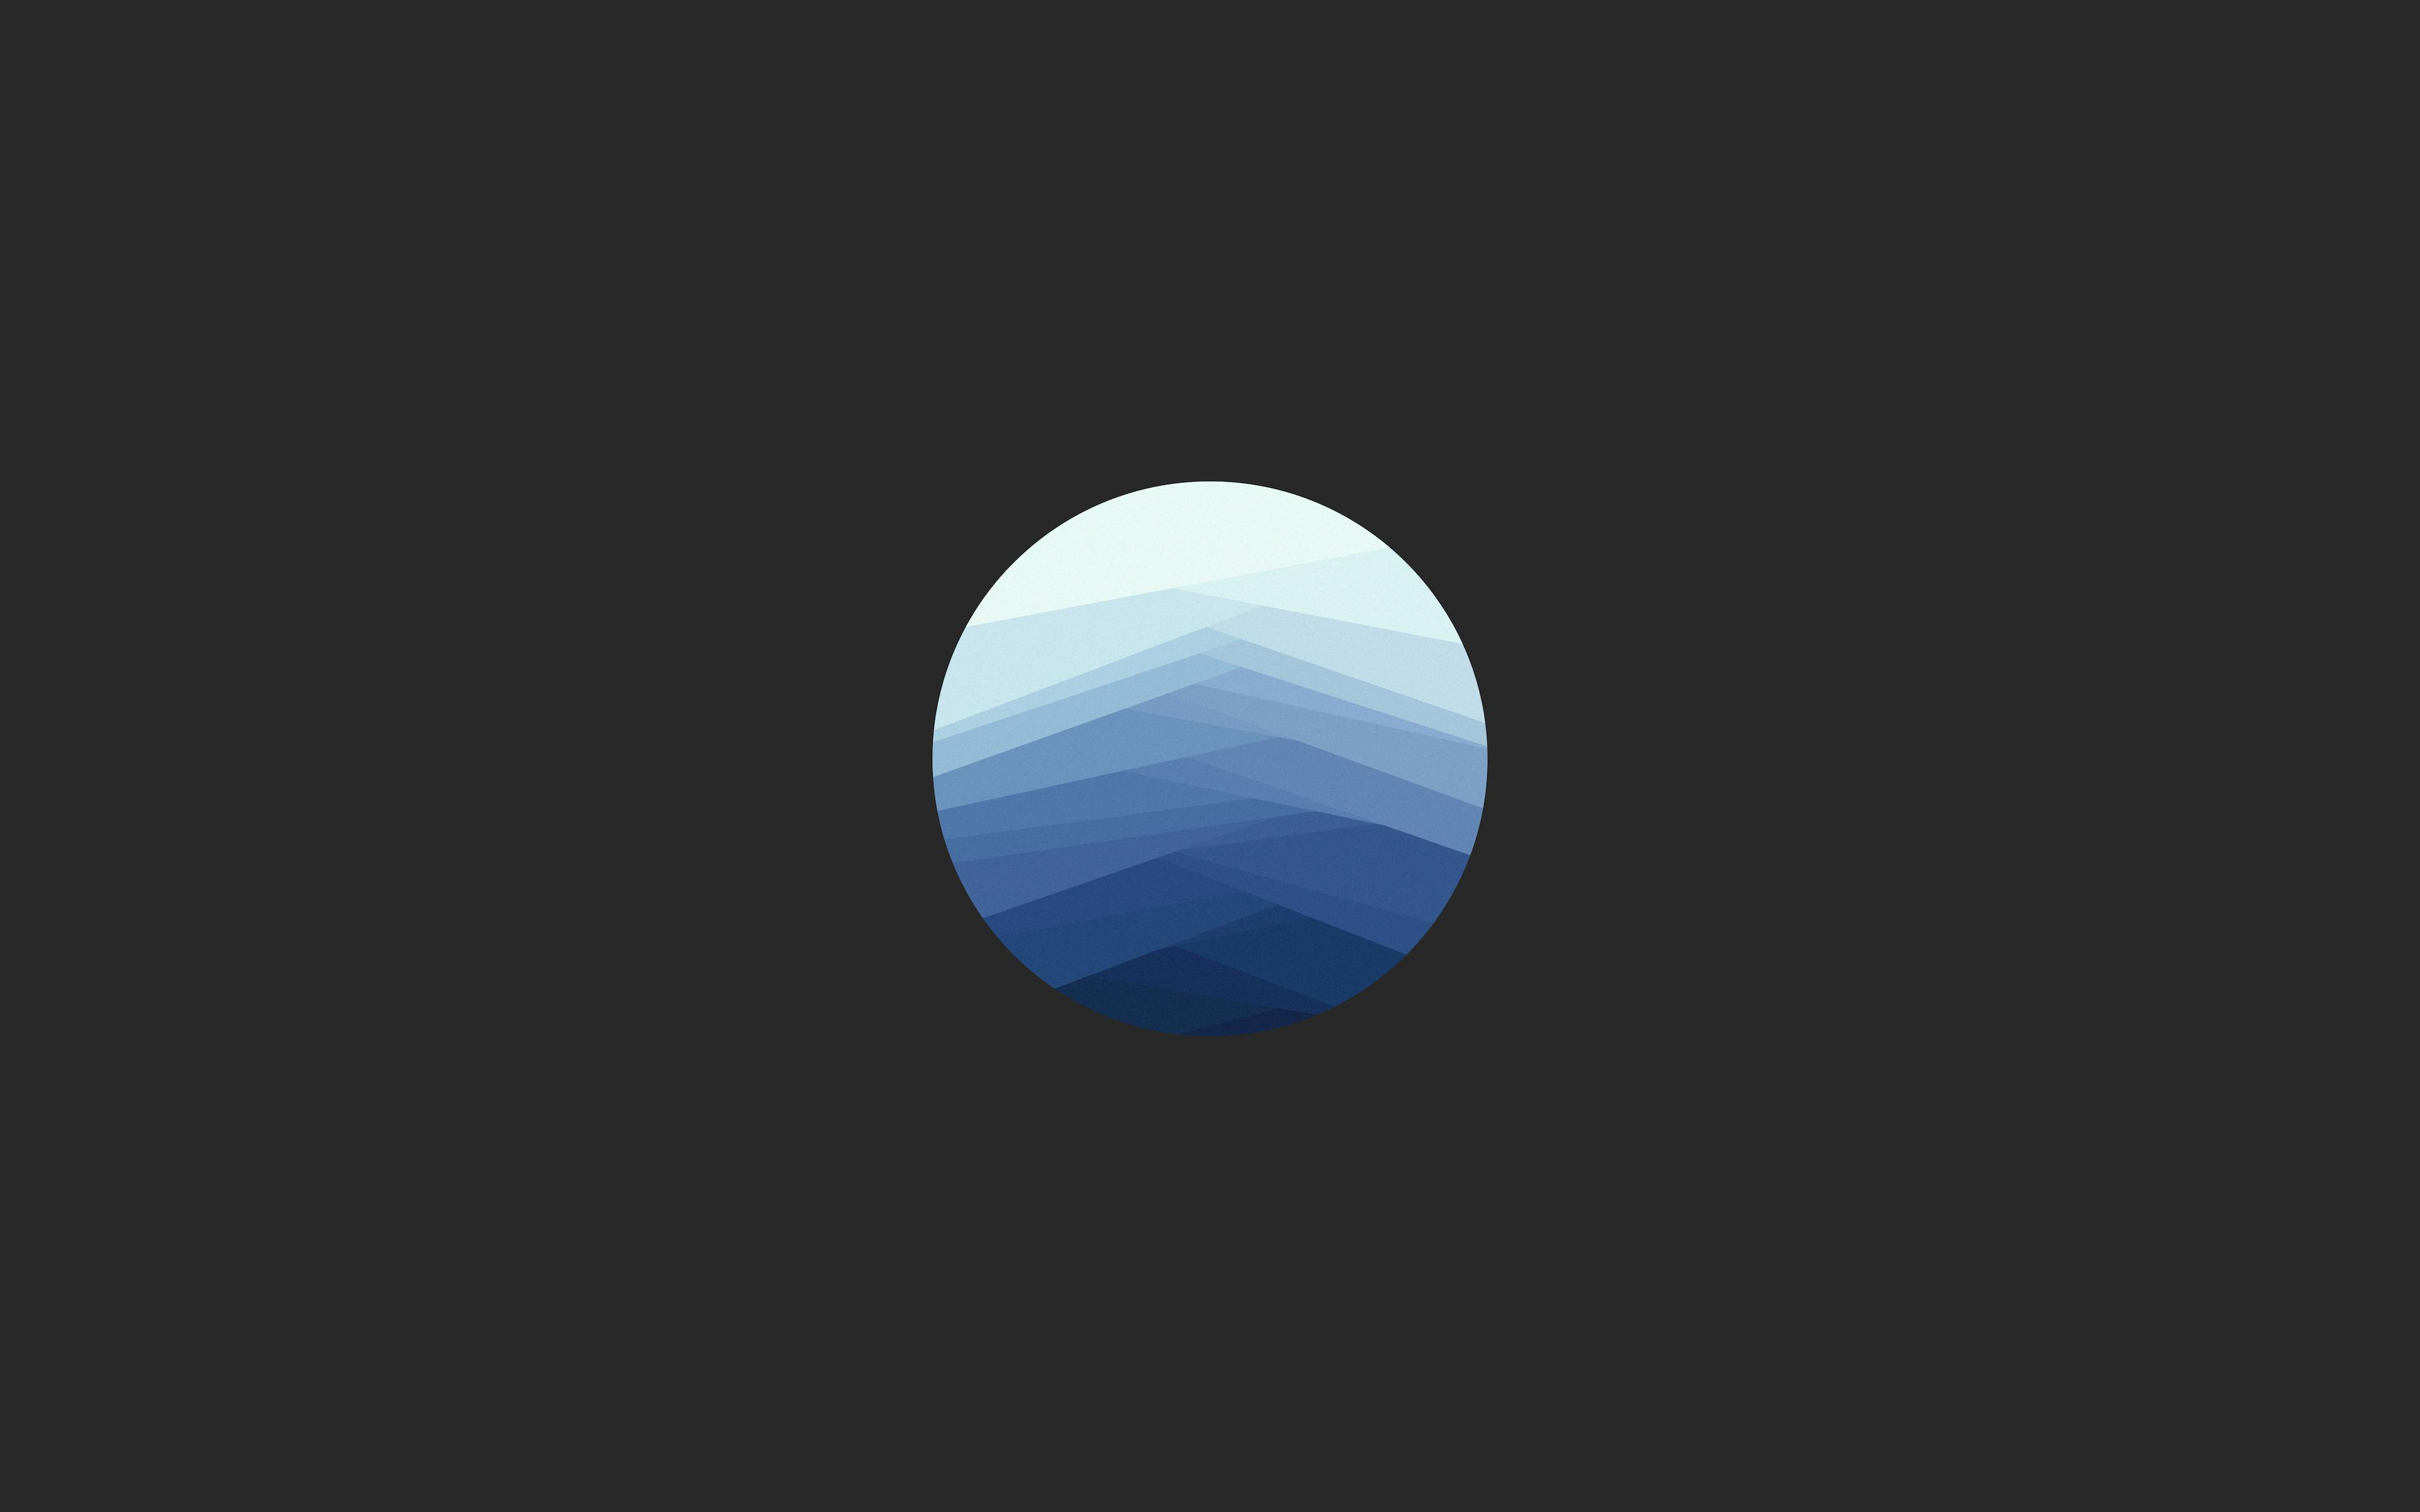 Minimal Blue Sphere 4k Wallpaper